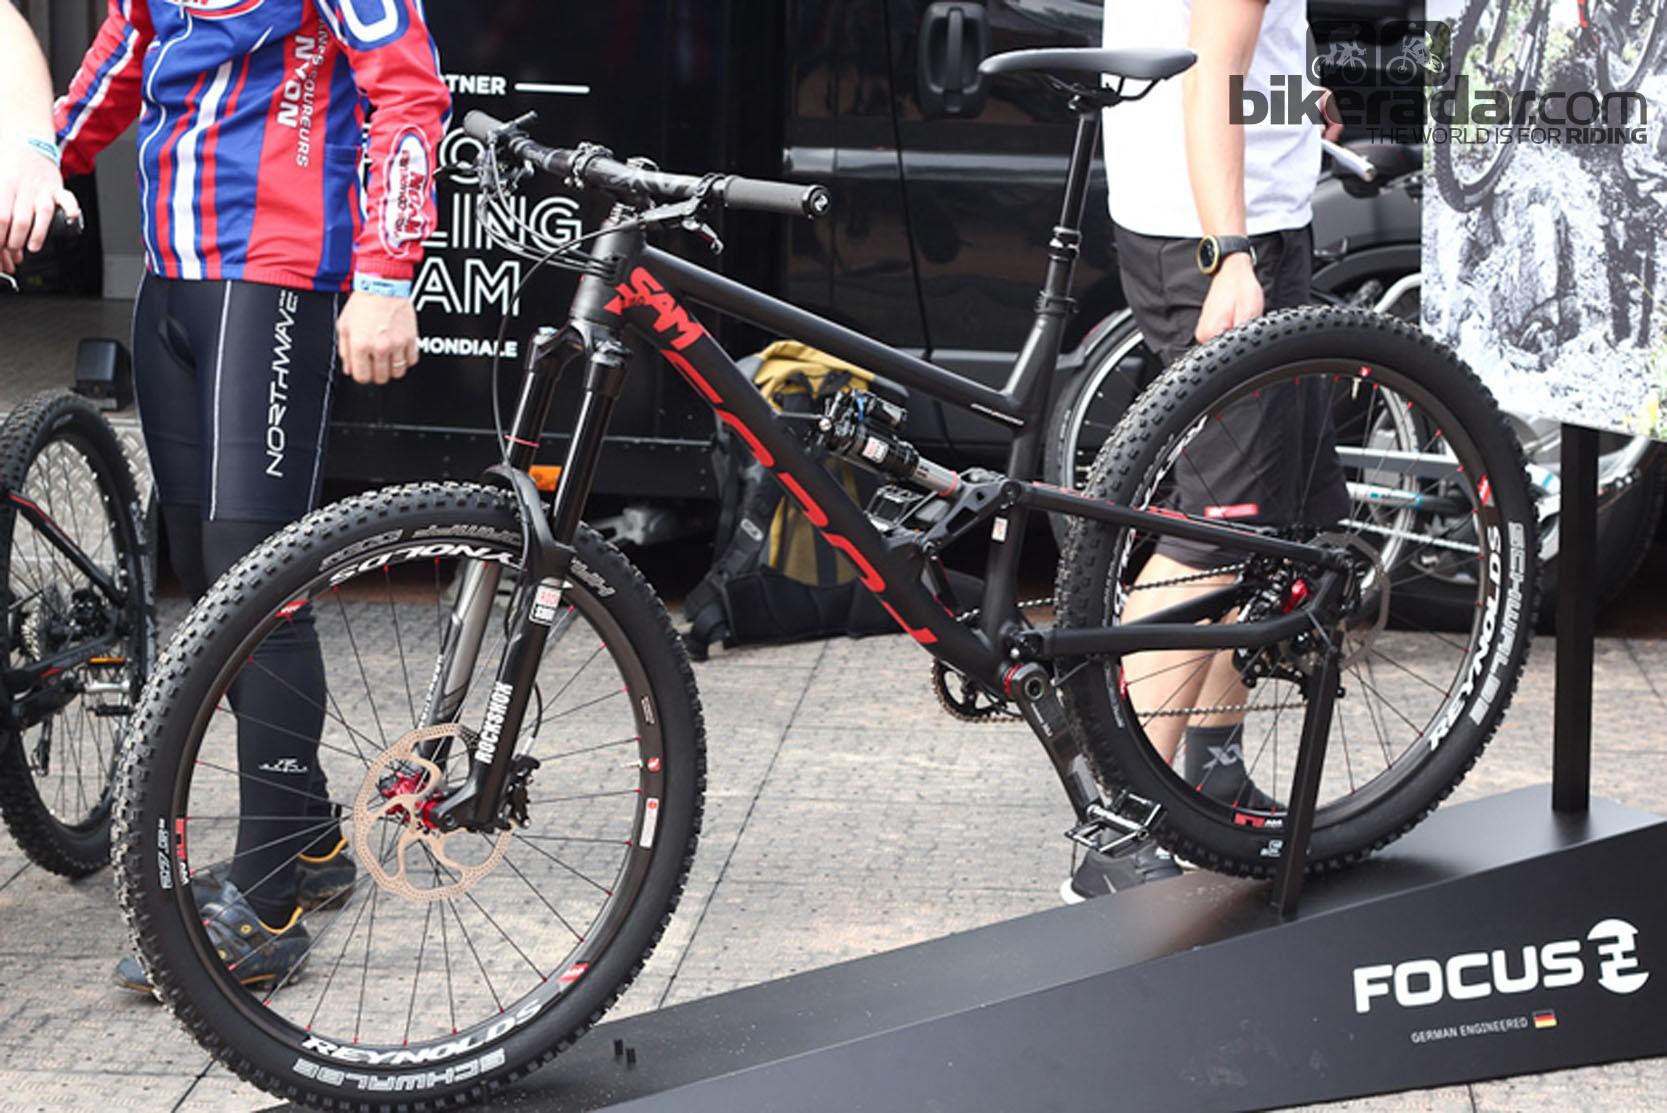 The new Focus SAM (Super All Mountain), a 650b, 160mm travel enduro bike